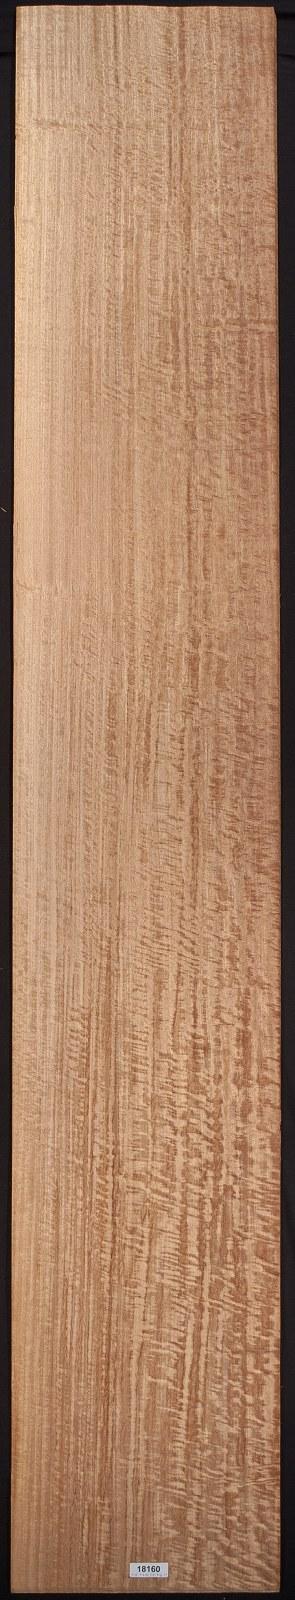 AAA Figured Eucalyptus Veneer Sheet